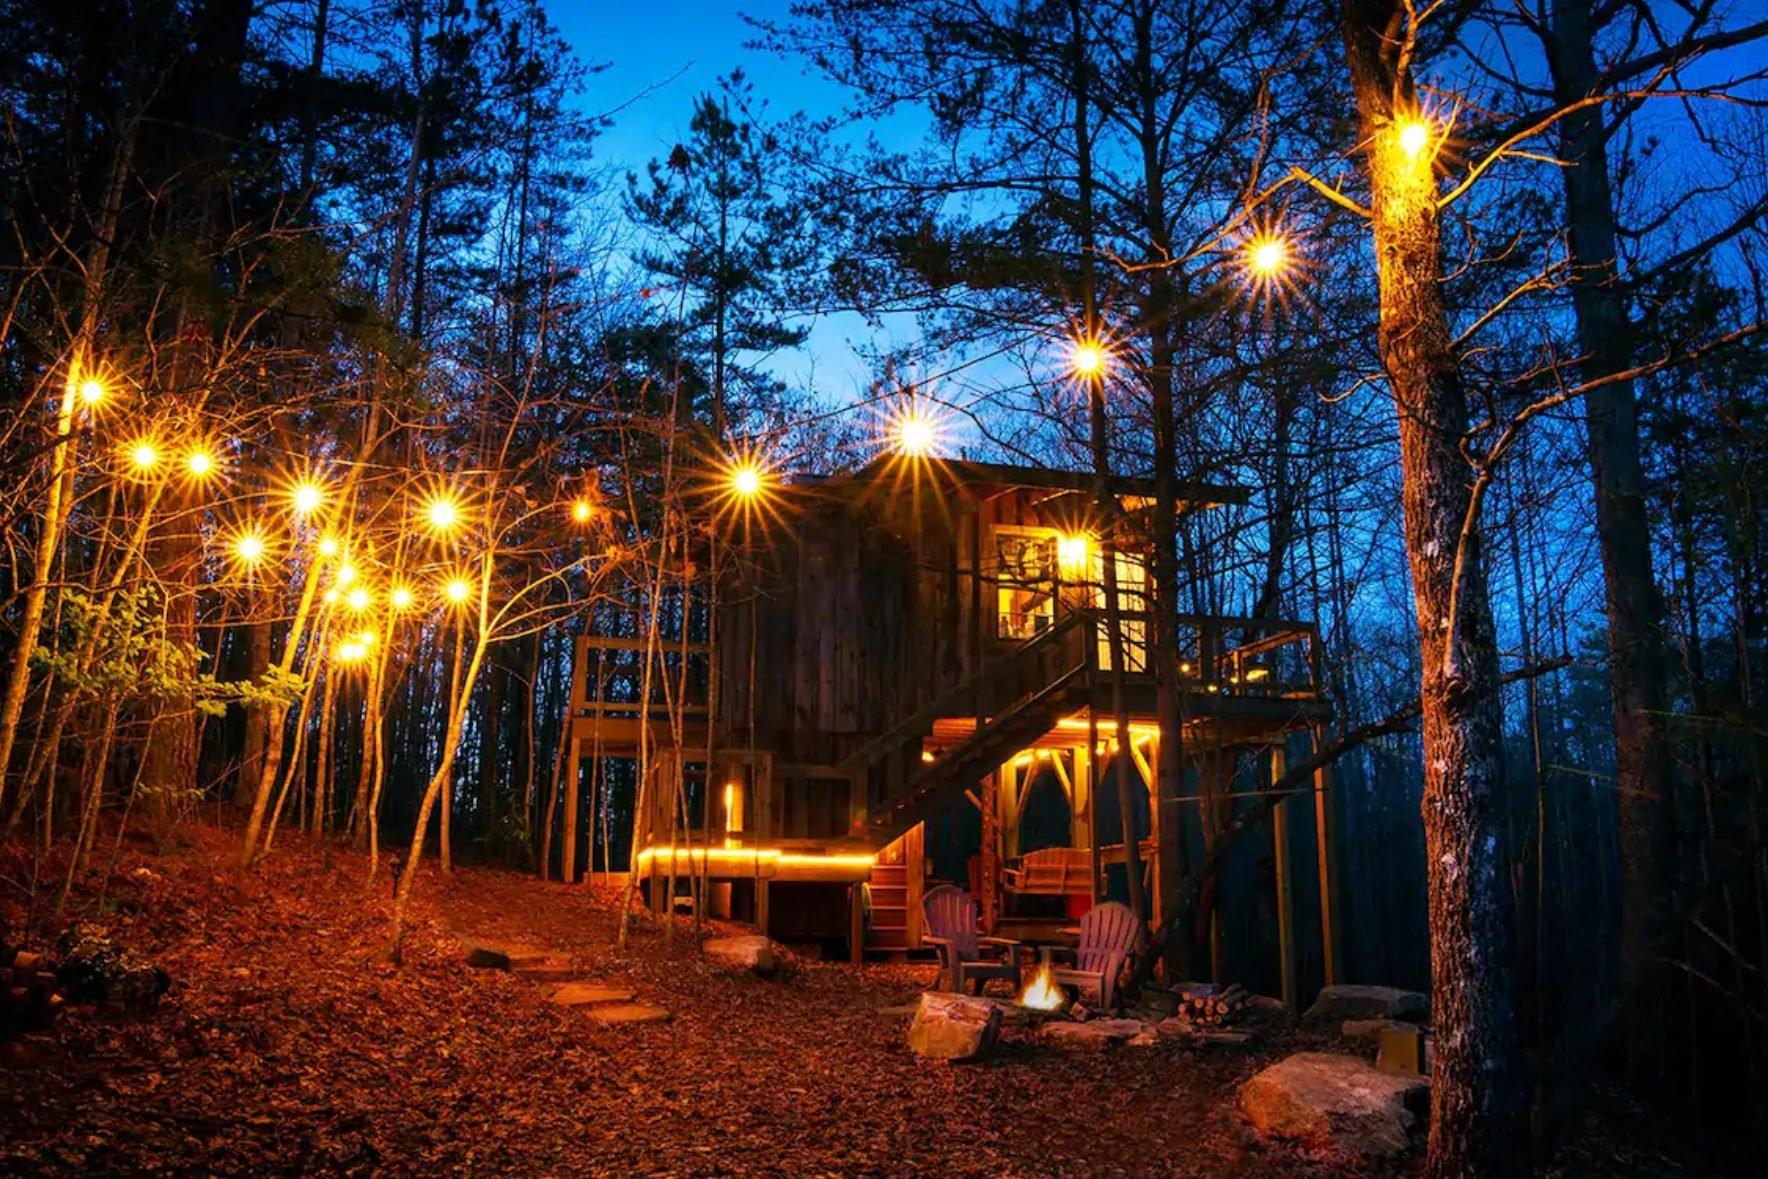 The Stella Vista Treehouse in Walhalla, South Carolina